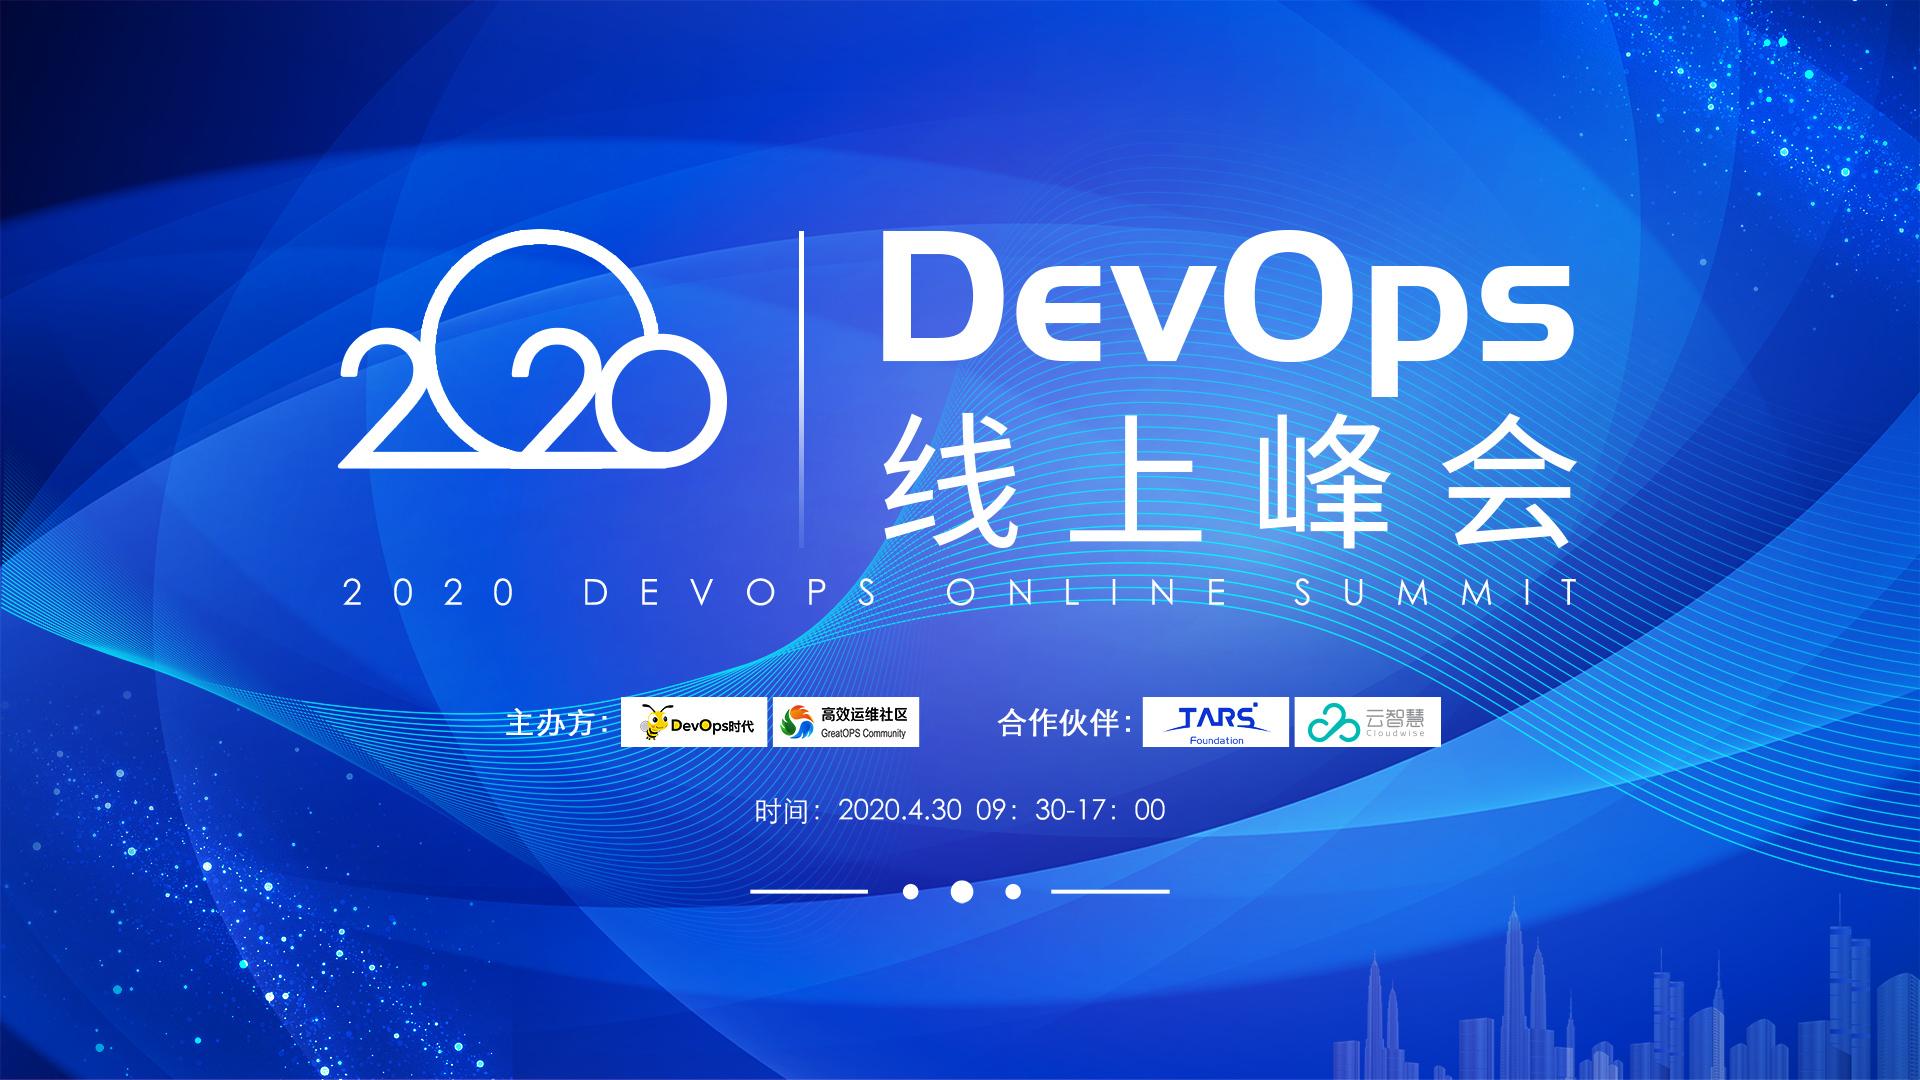 2020 DevOps 线上峰会